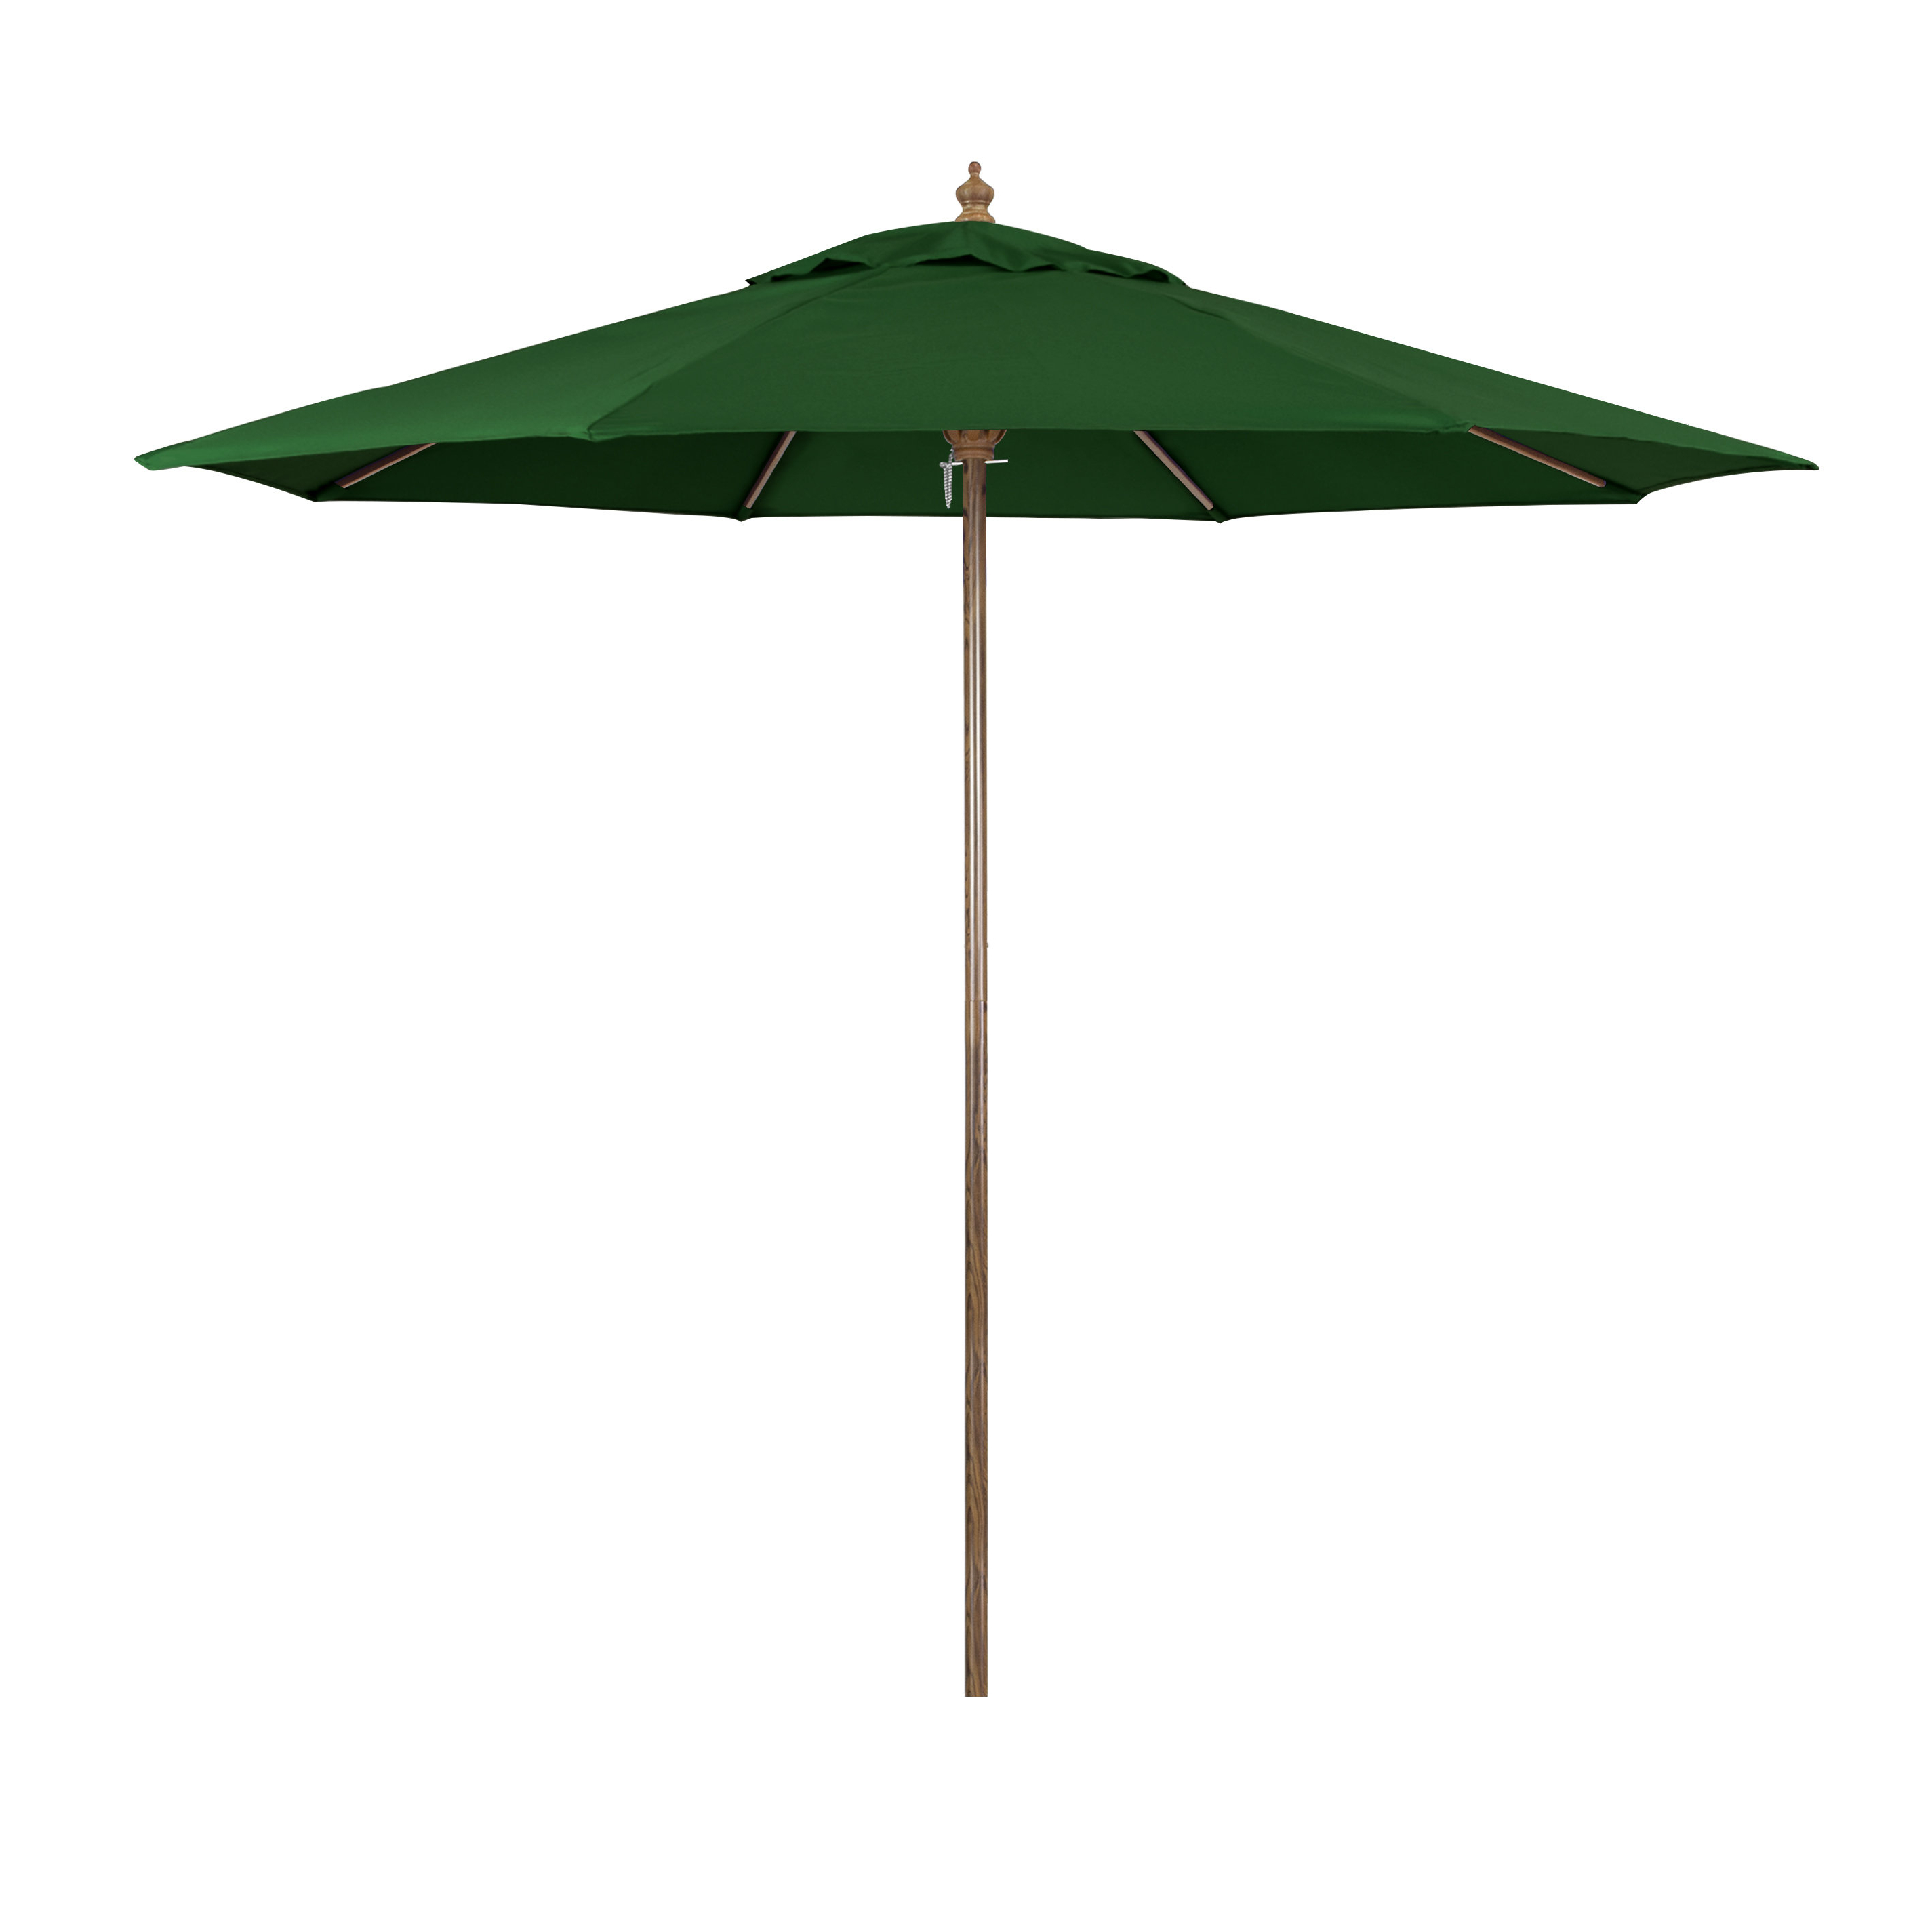 Ryant Cantilever Umbrellas Regarding Preferred Ryant 9' Market Umbrella (View 20 of 20)